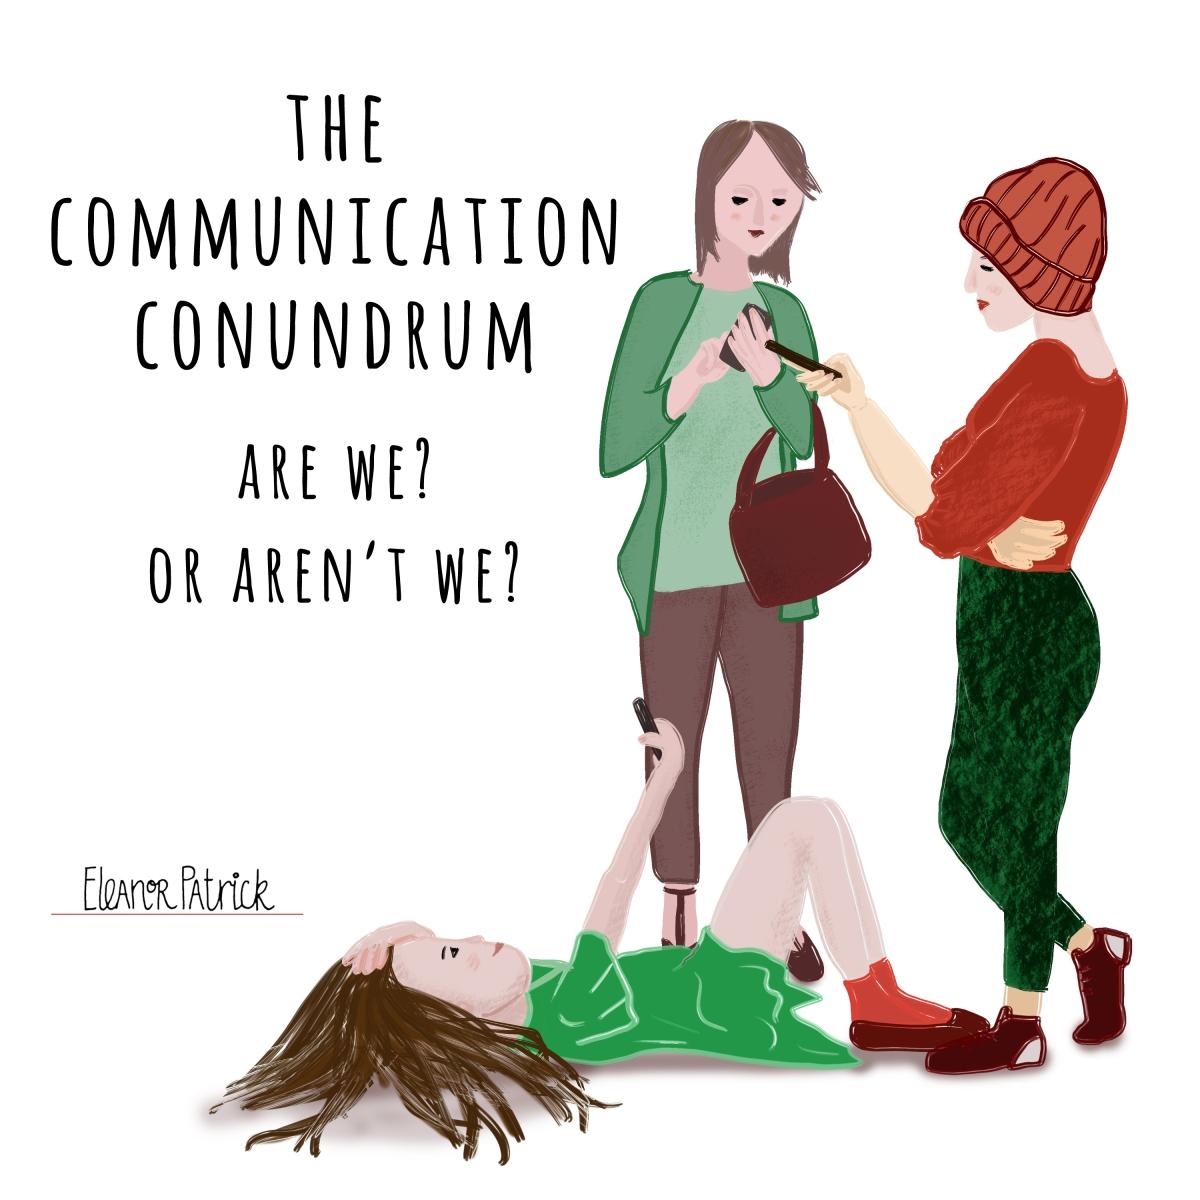 Editorial Communication Conundrum